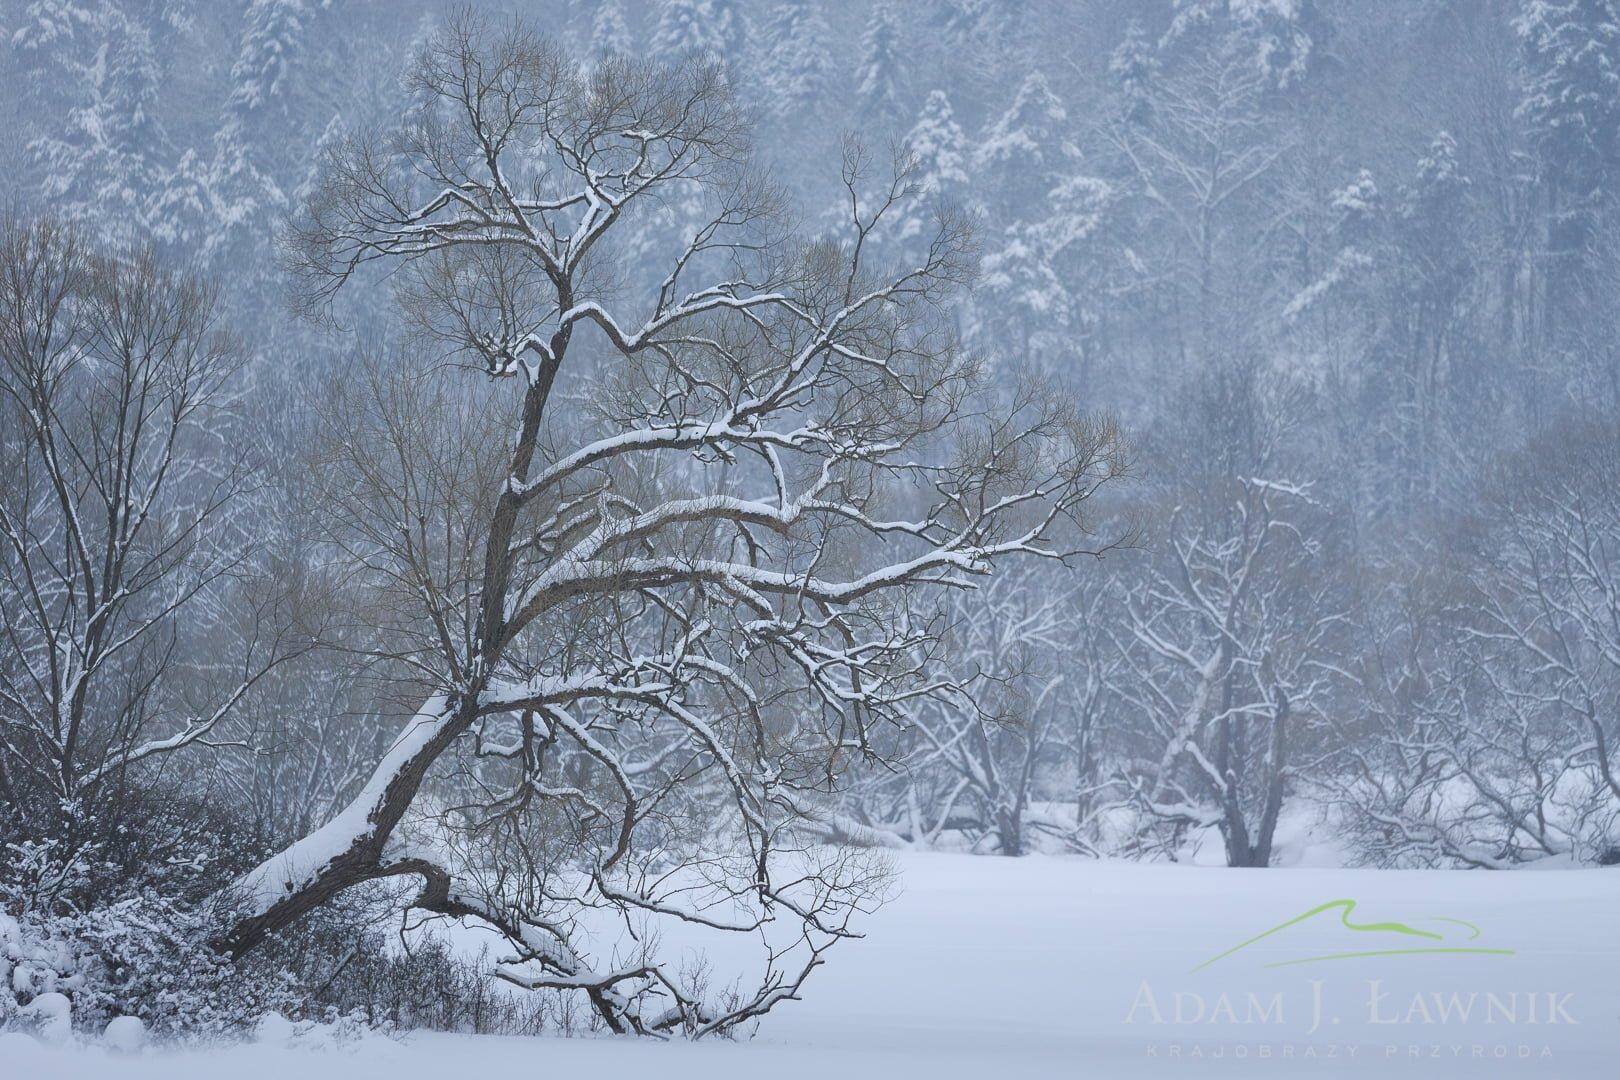 Magura National Park, Poland 1701-00116C